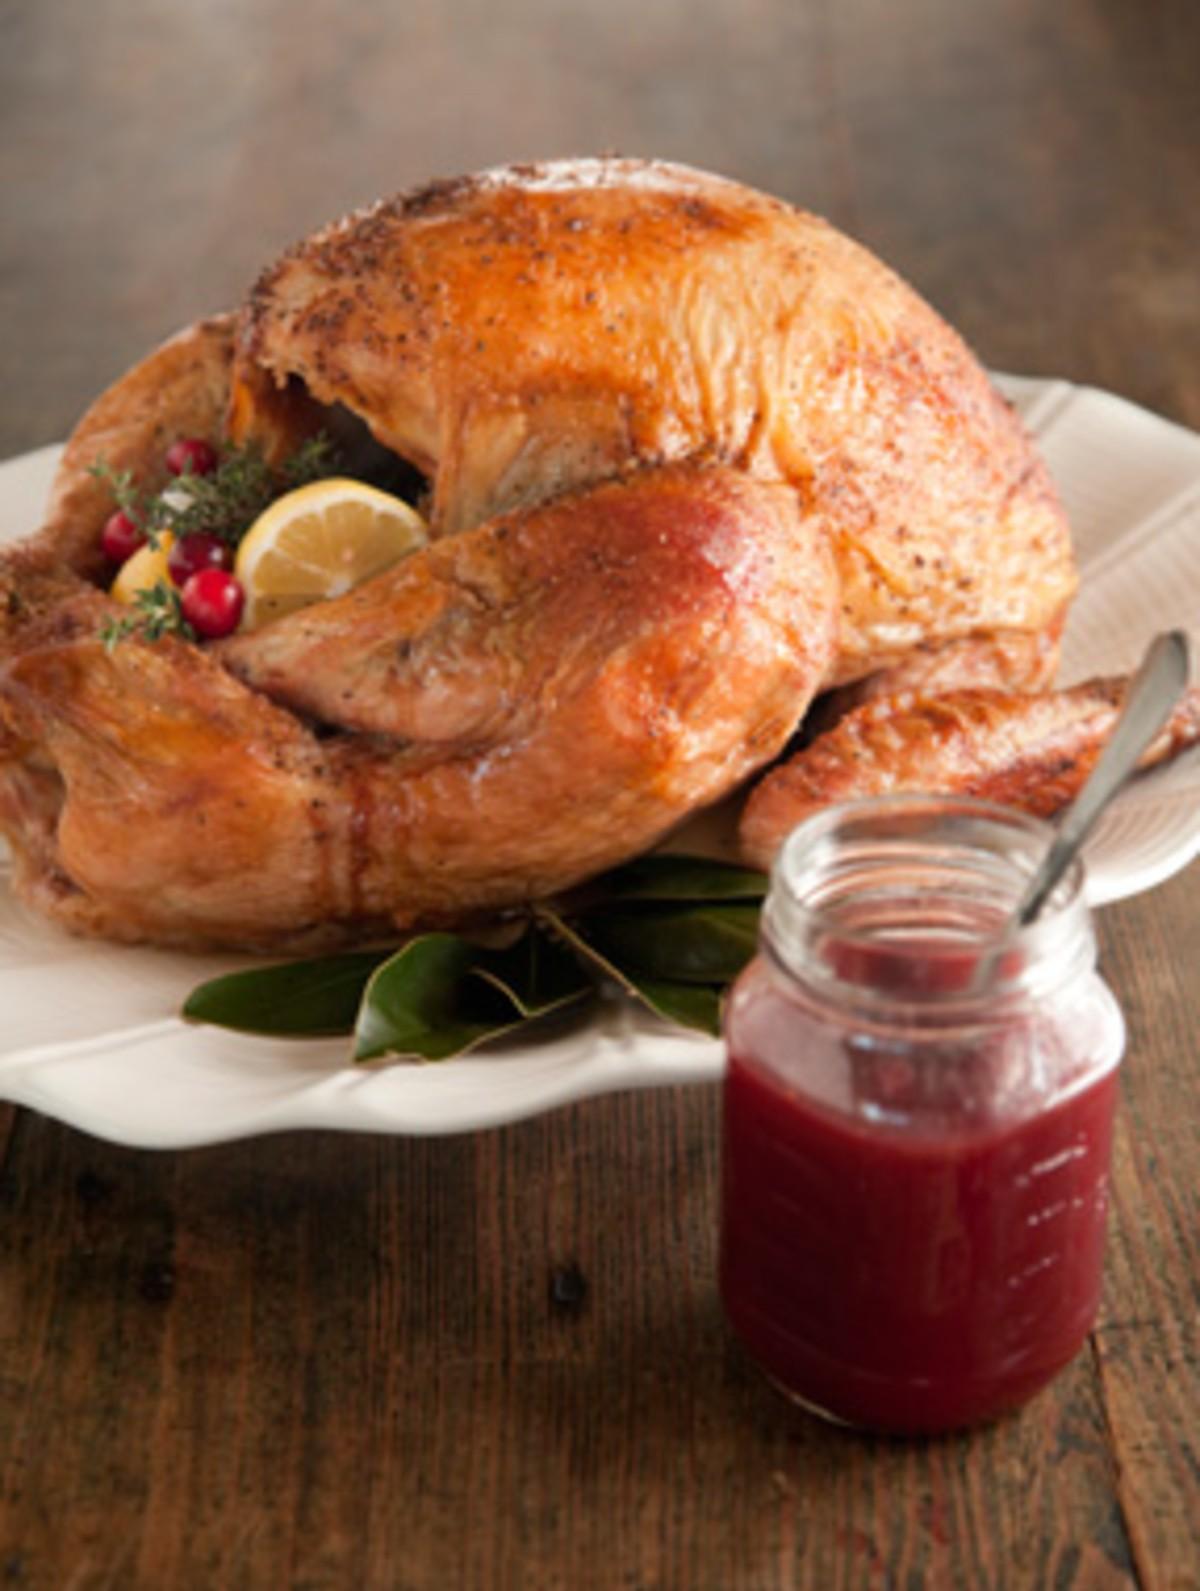 Roasted Turkey with Maple Cranberry Glaze